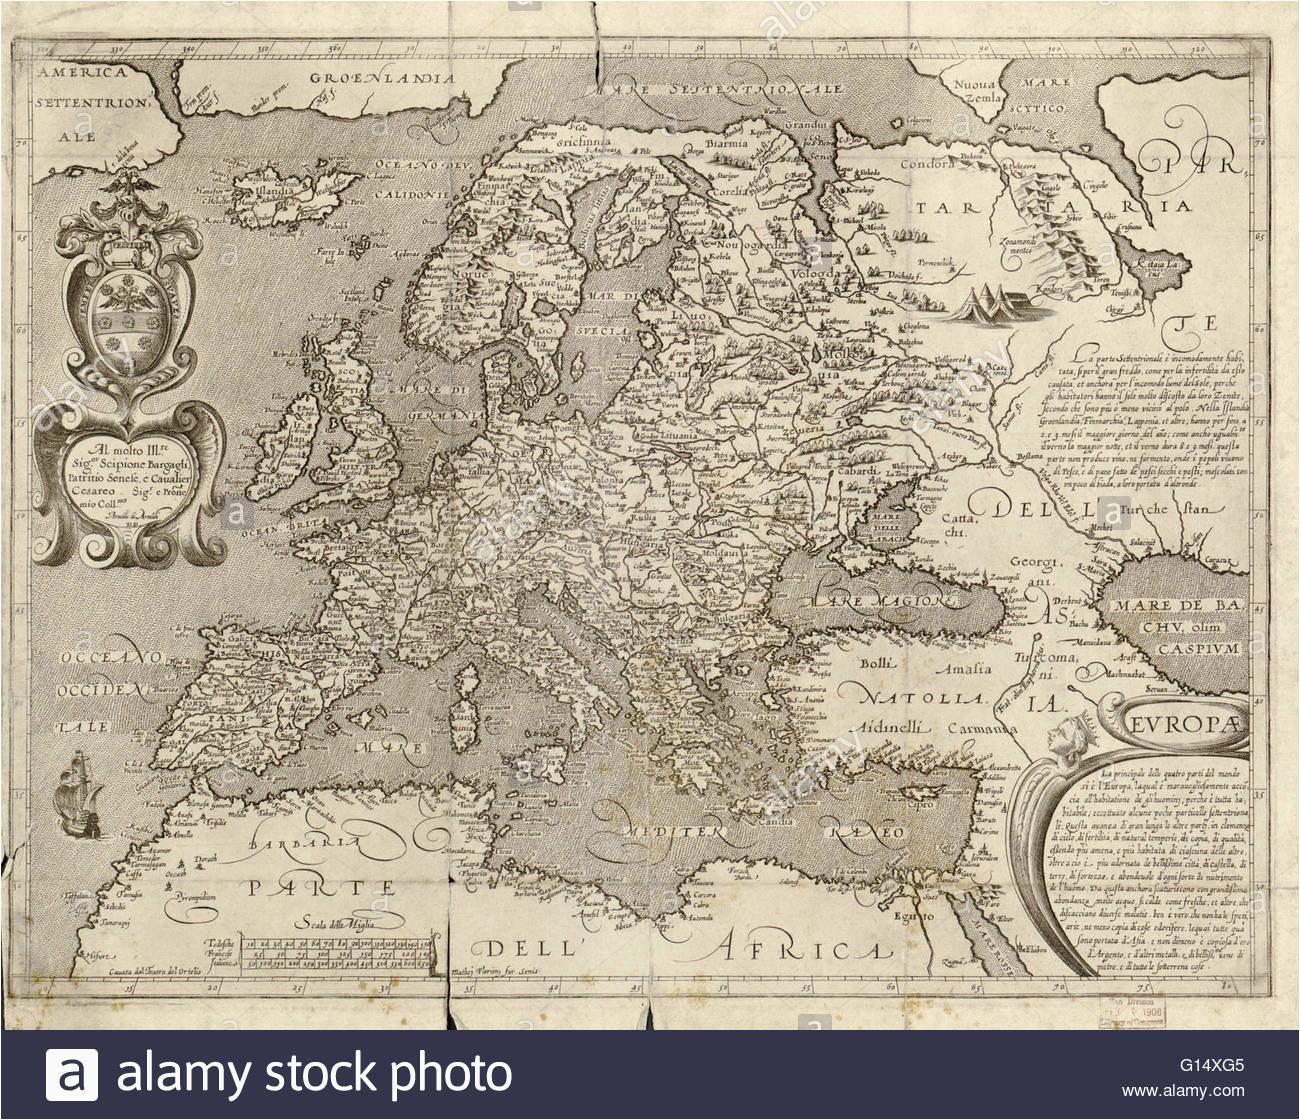 historical map europe stock photos historical map europe